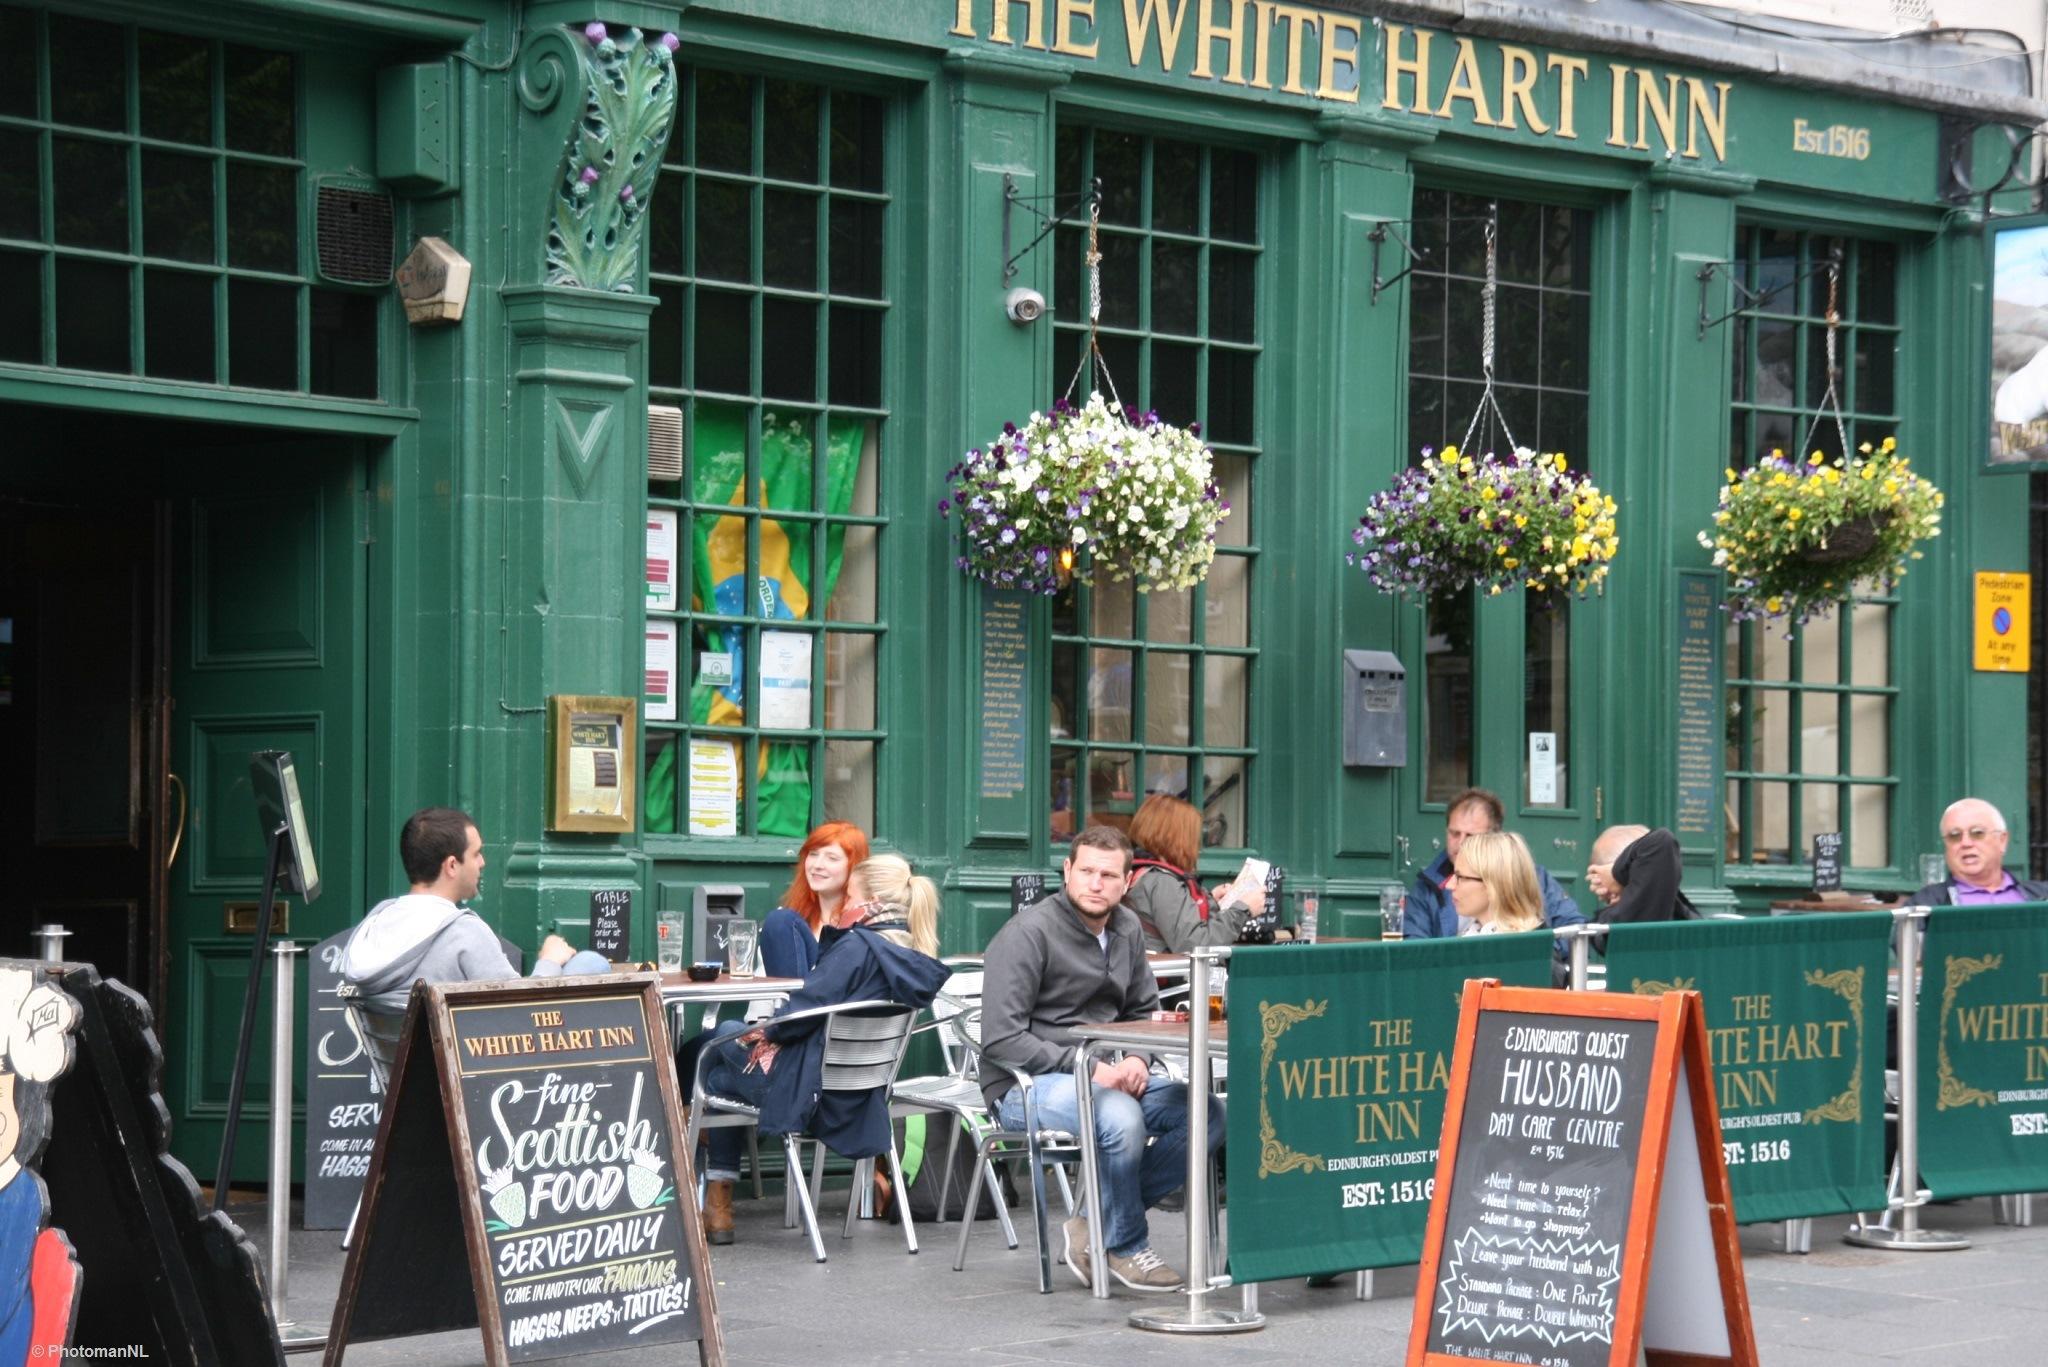 The White Heart Inn by PhotomanNL